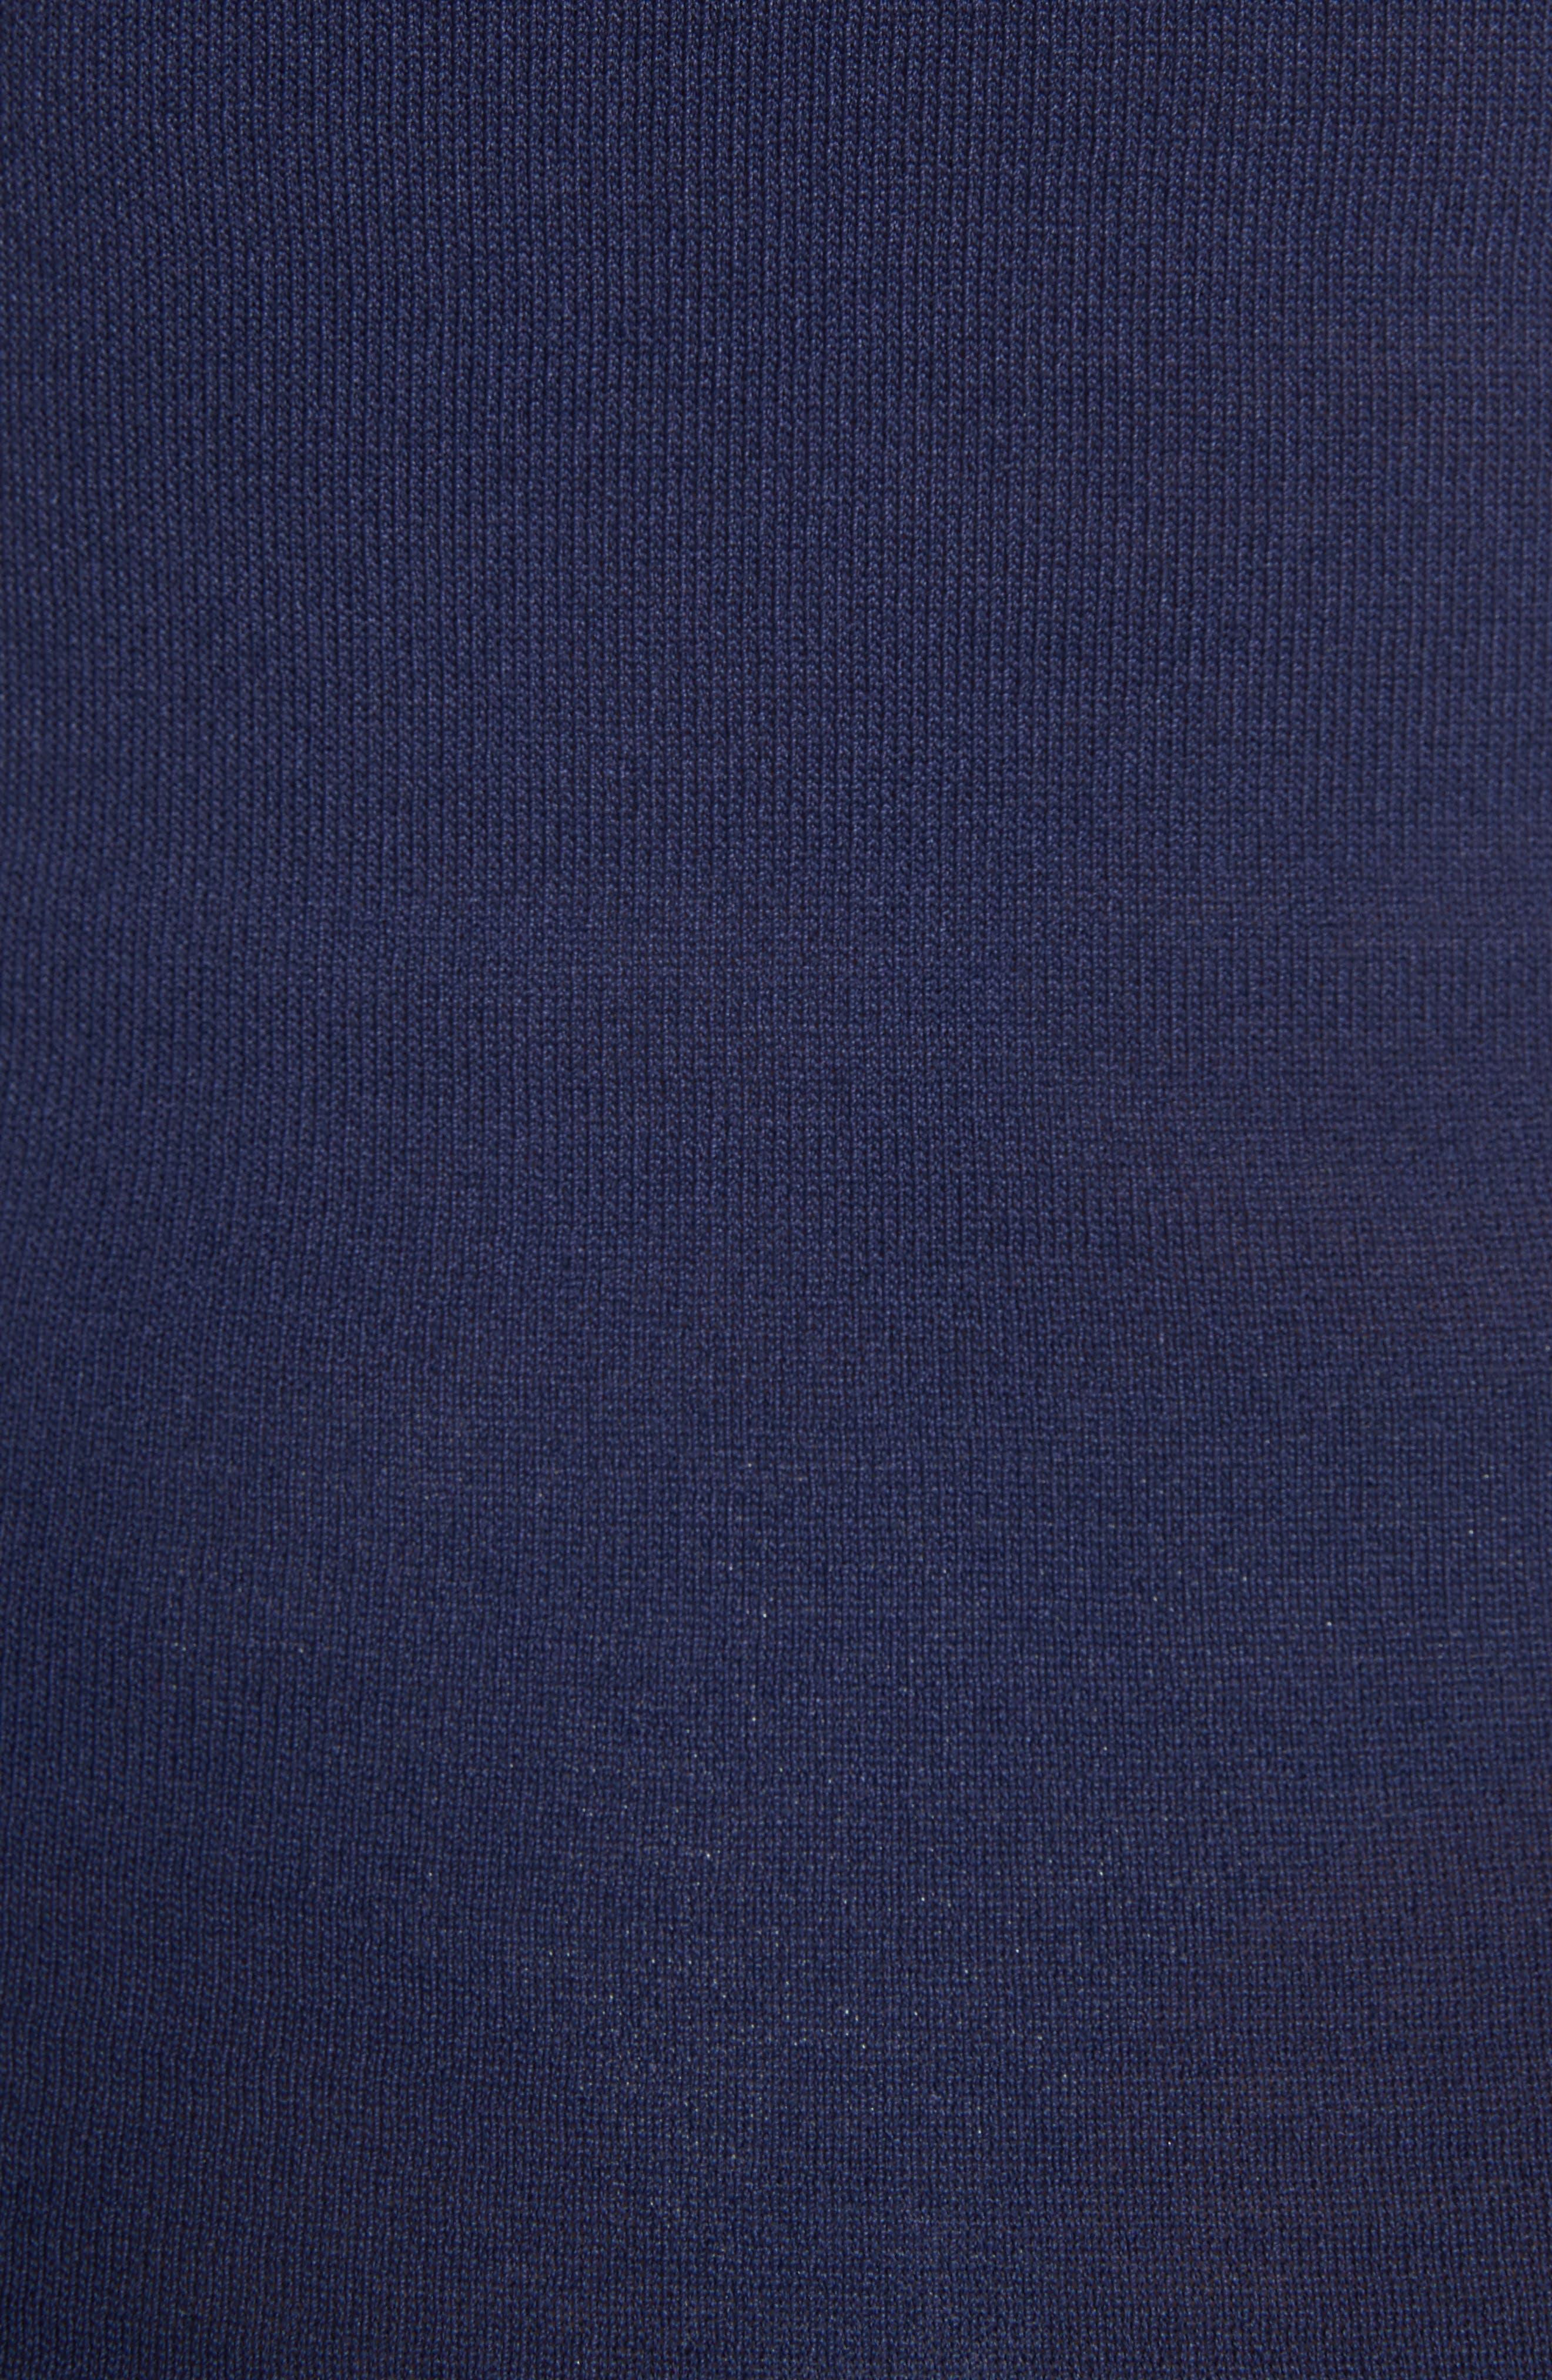 Chevron Knit Dress,                             Alternate thumbnail 5, color,                             416